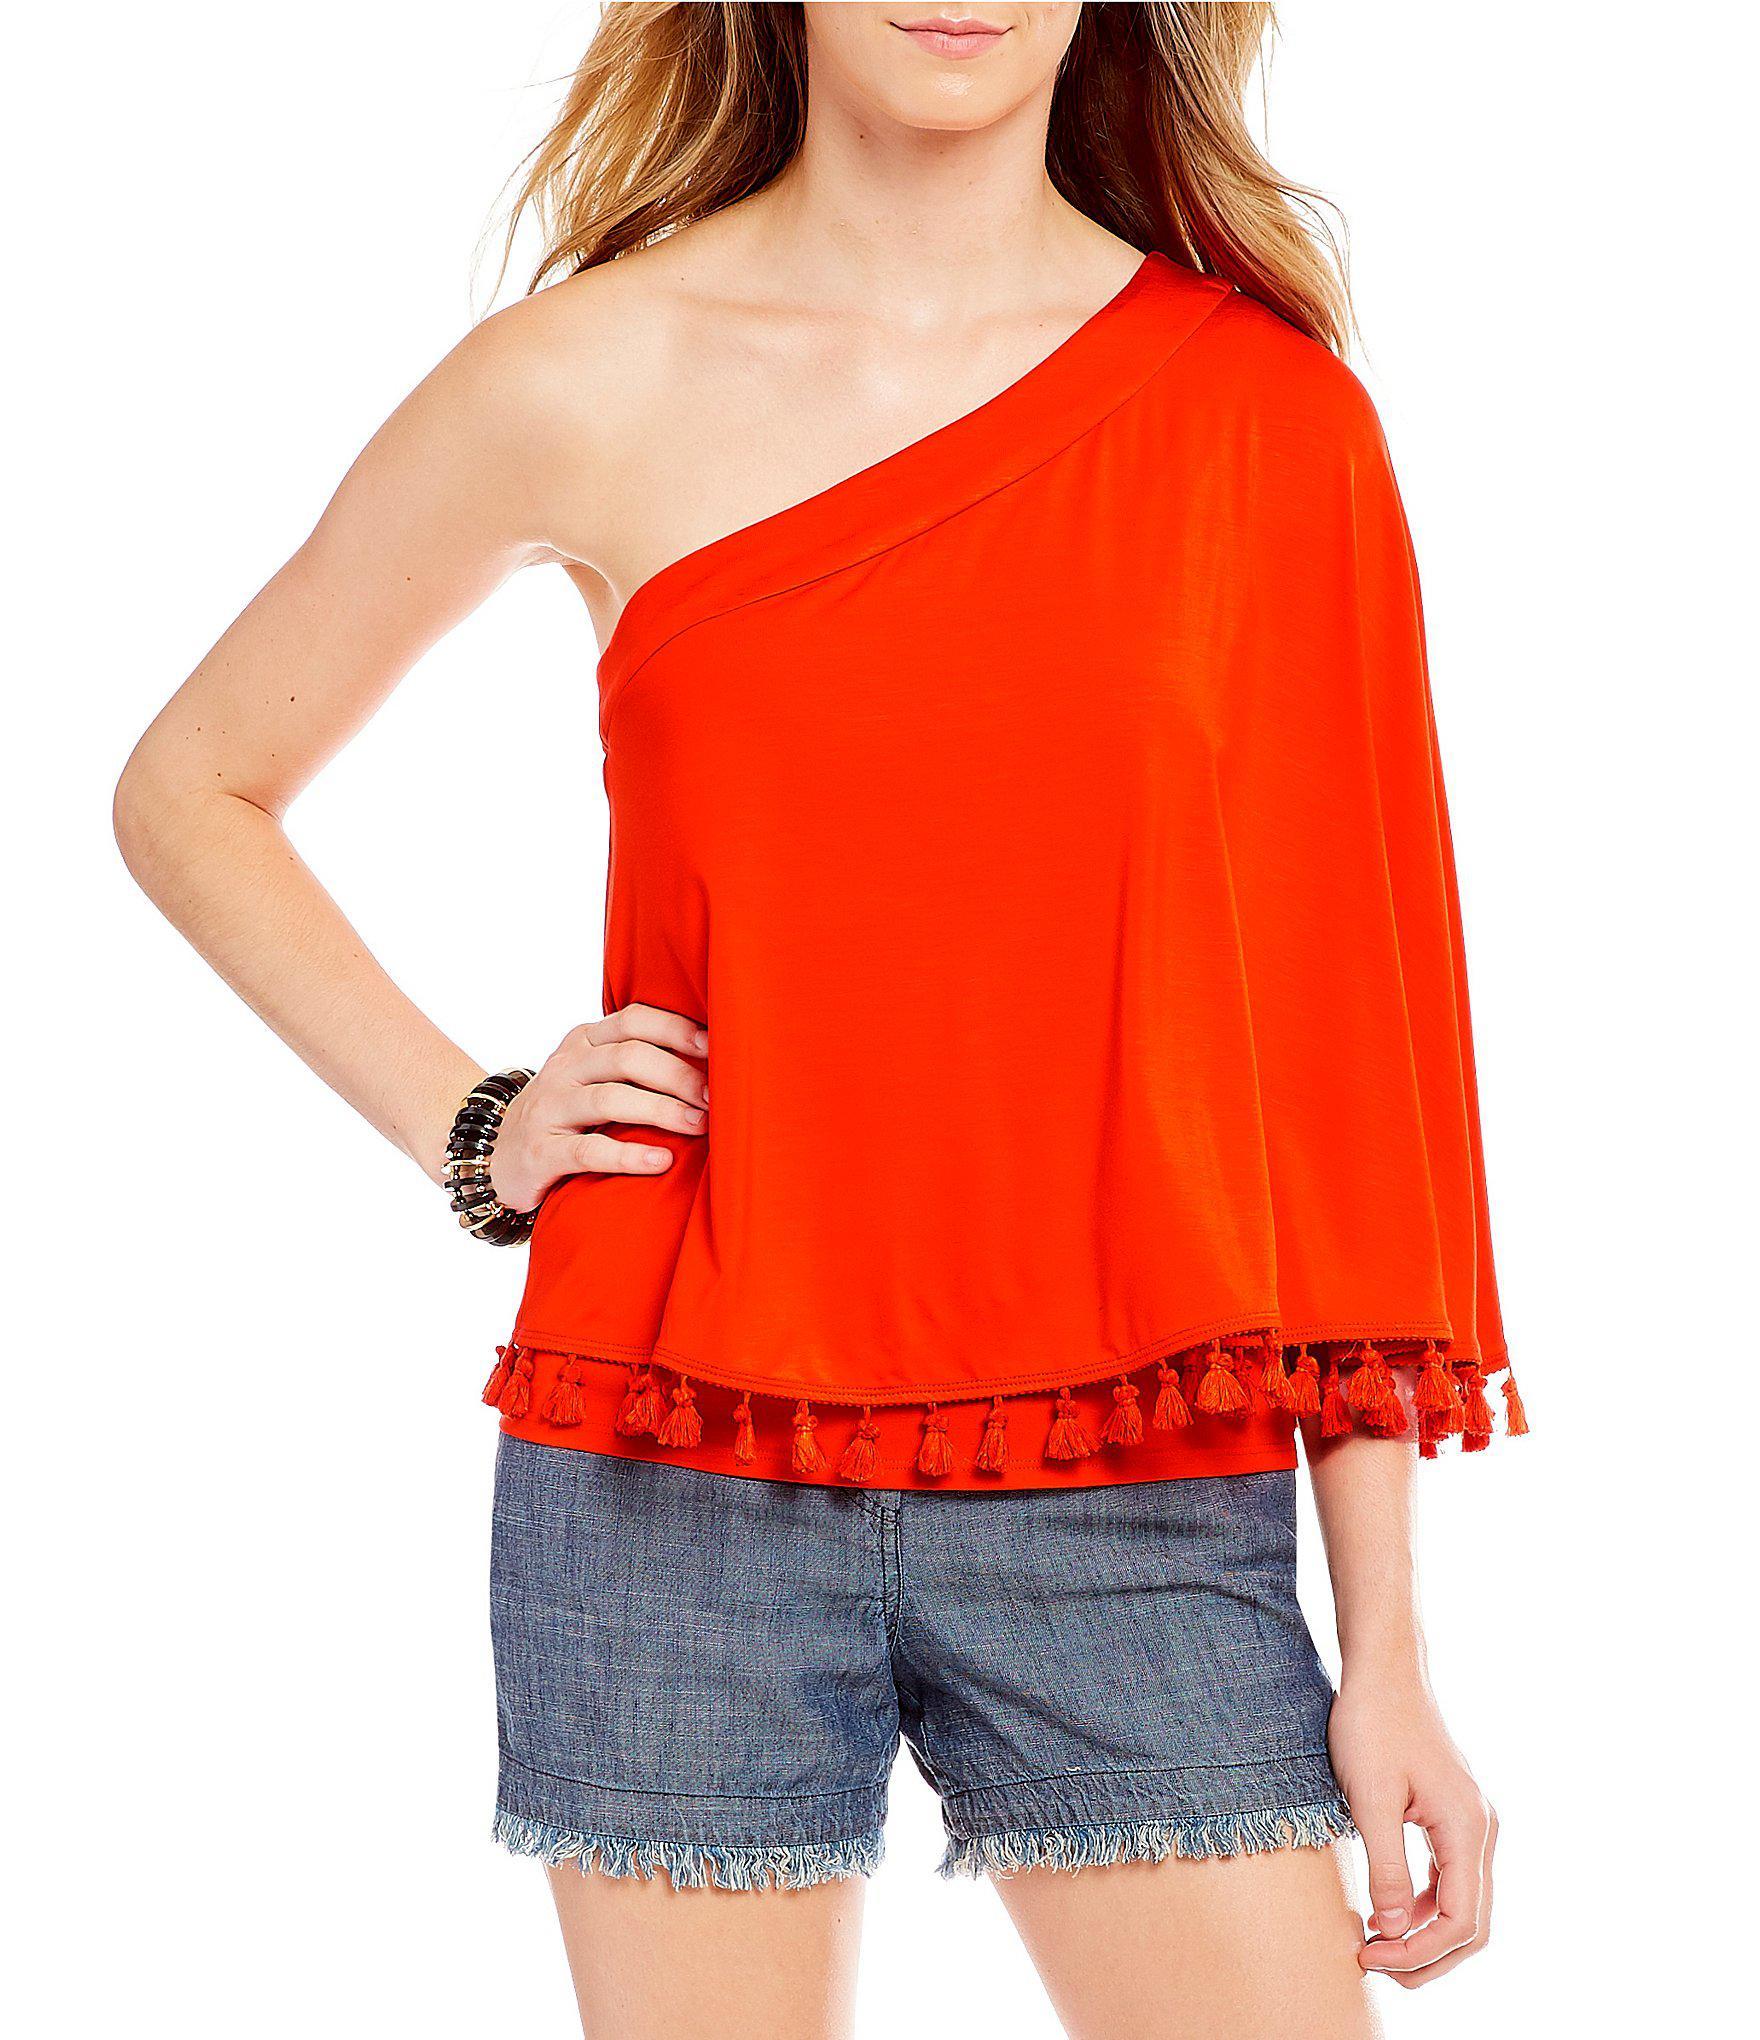 8be8a0aeac7db5 Lyst - Trina Turk Pomona Knit Jersey Tassel Trim One Shoulder Top